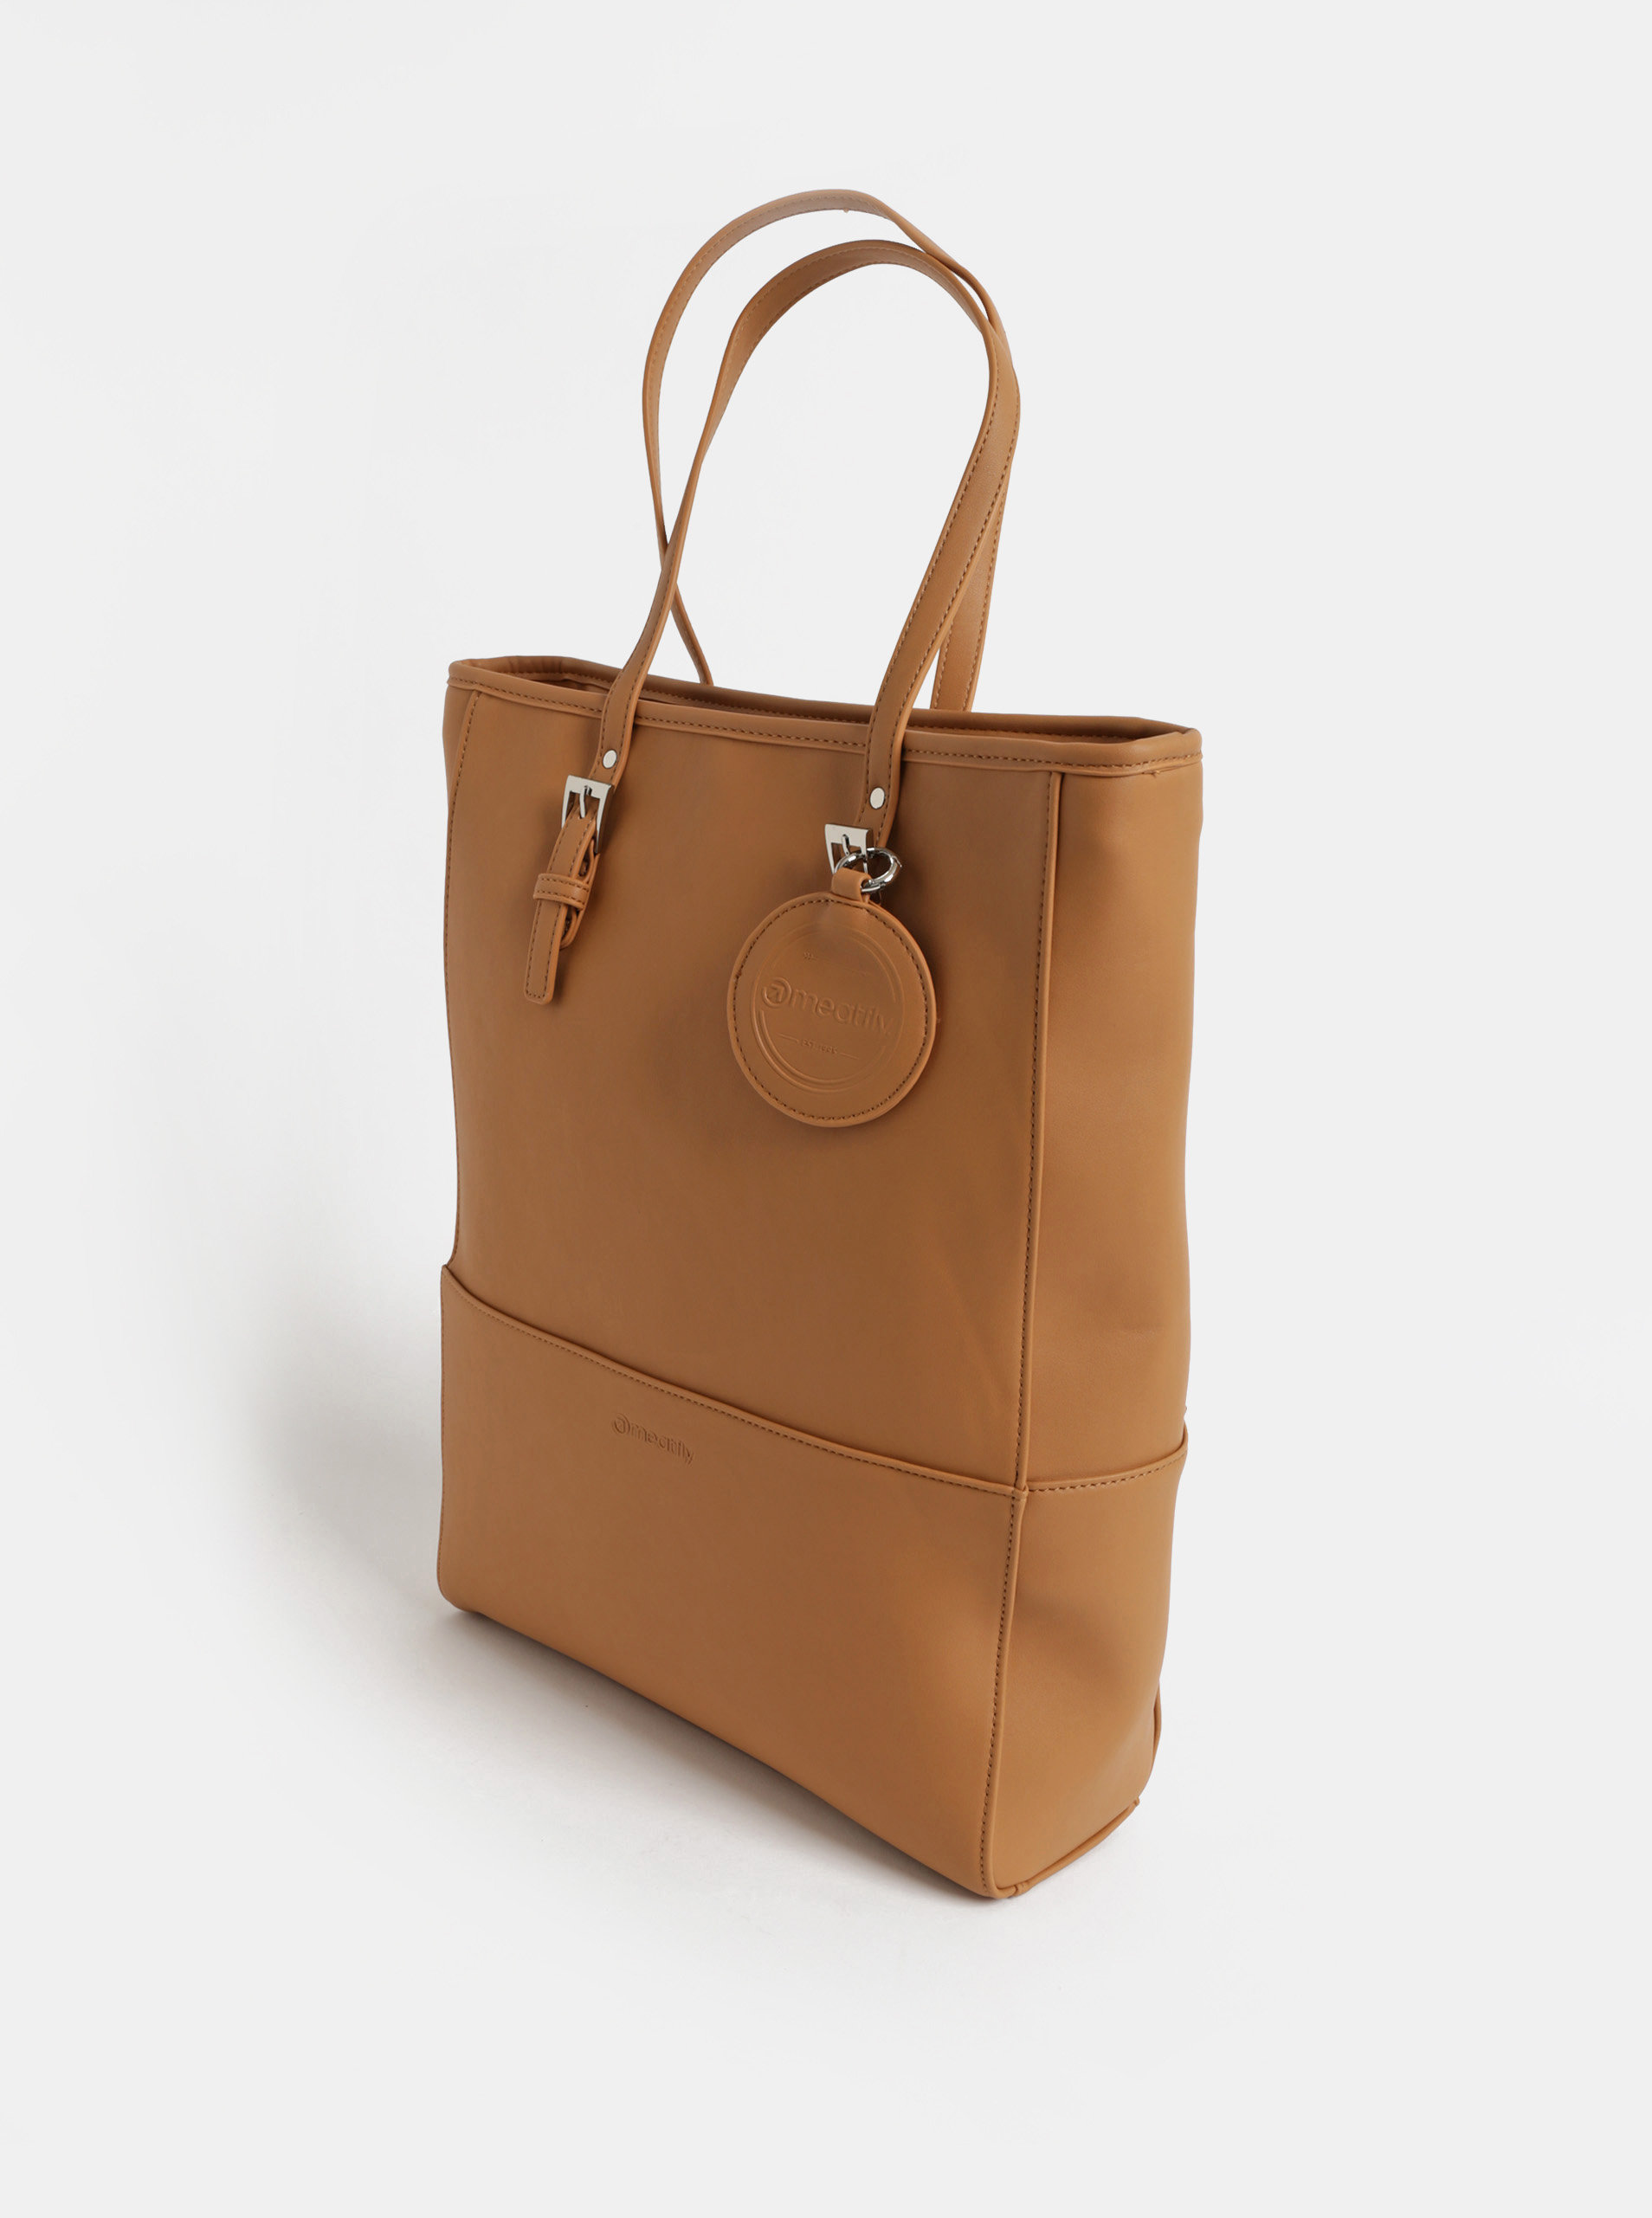 Hnedá veľká kabelka Meatfly ... 1268b00acce